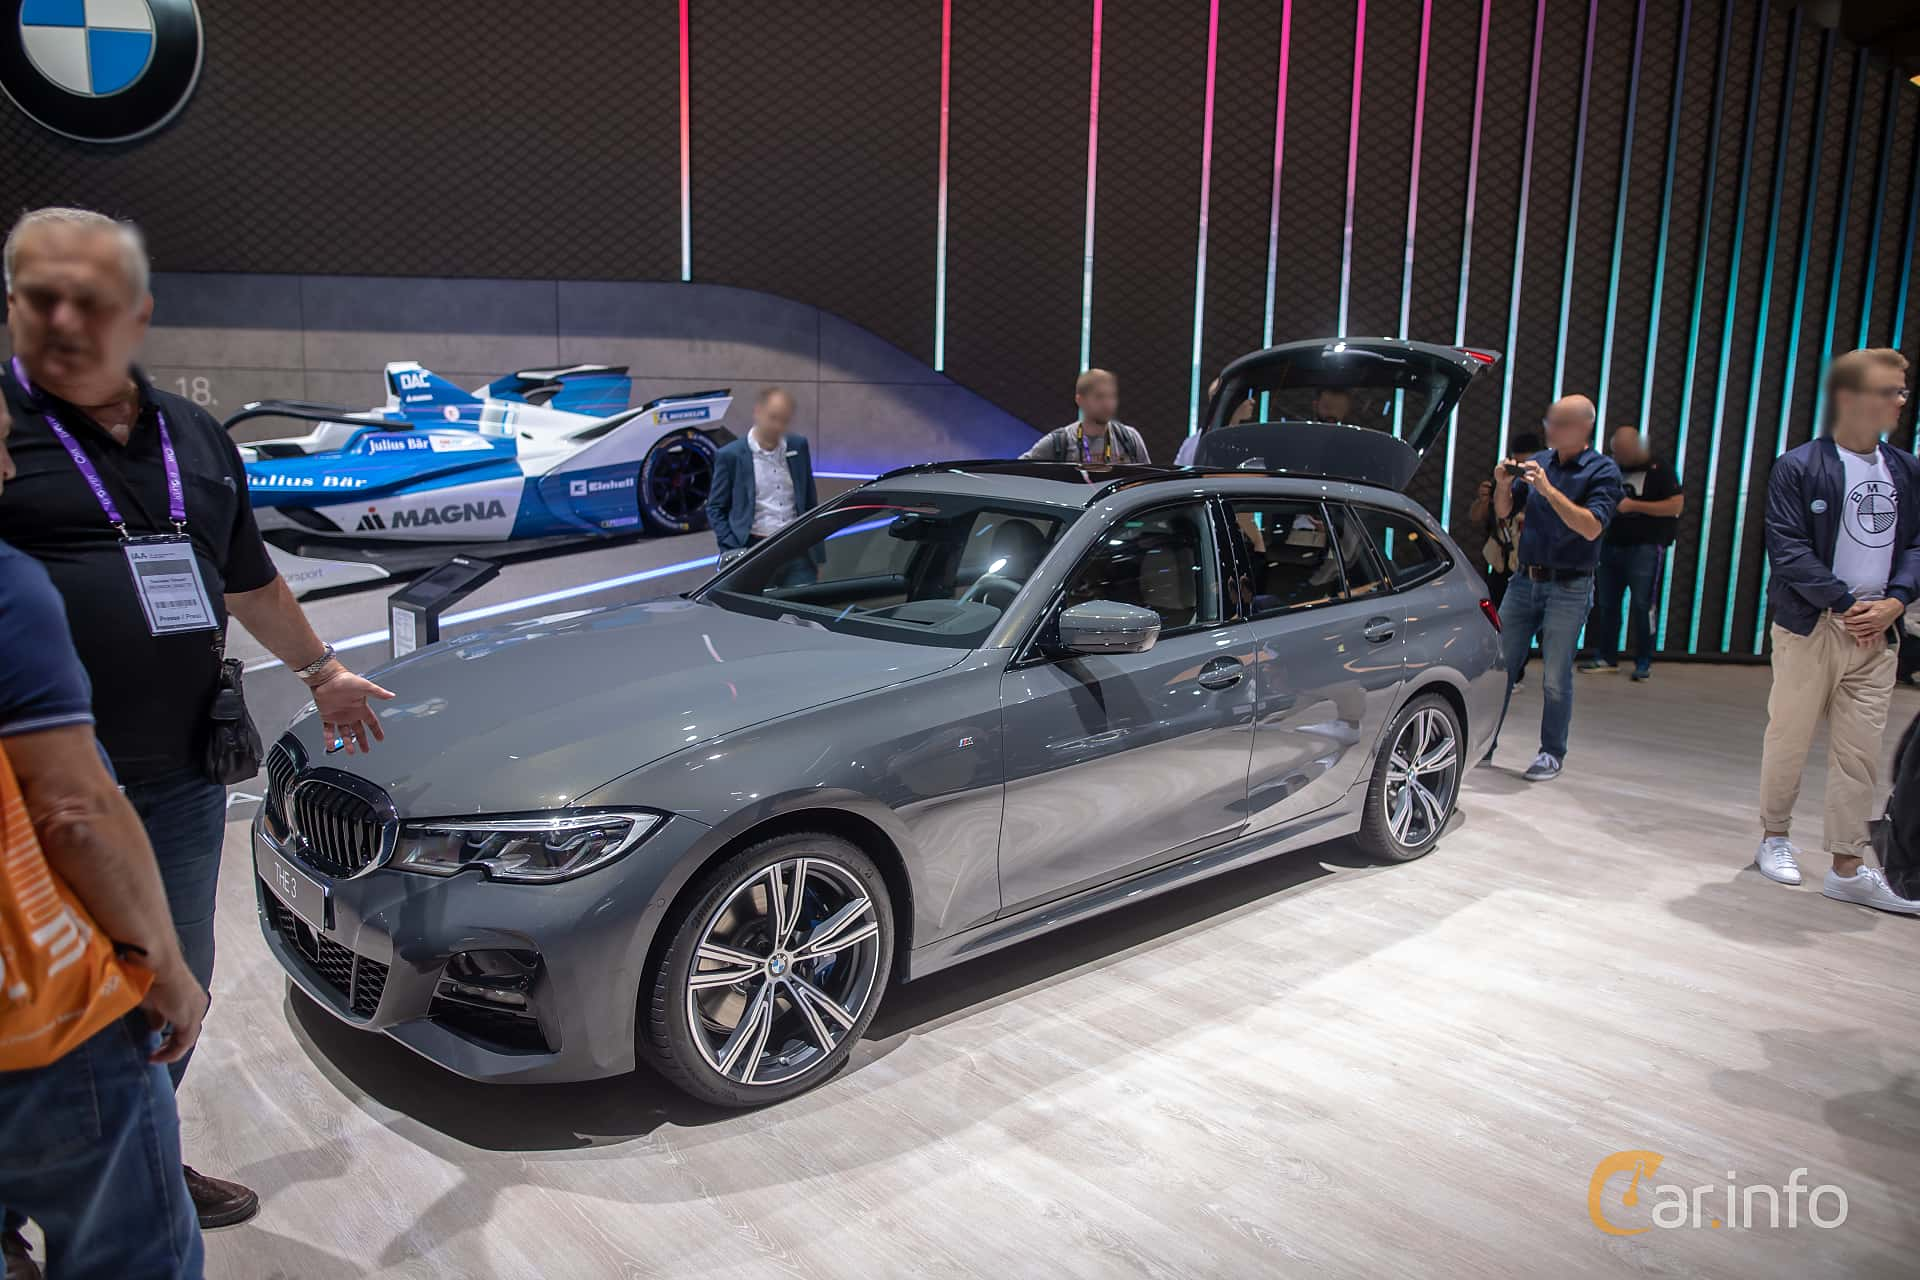 BMW 330d xDrive Touring  Steptronic, 265hp, 2020 at IAA 2019